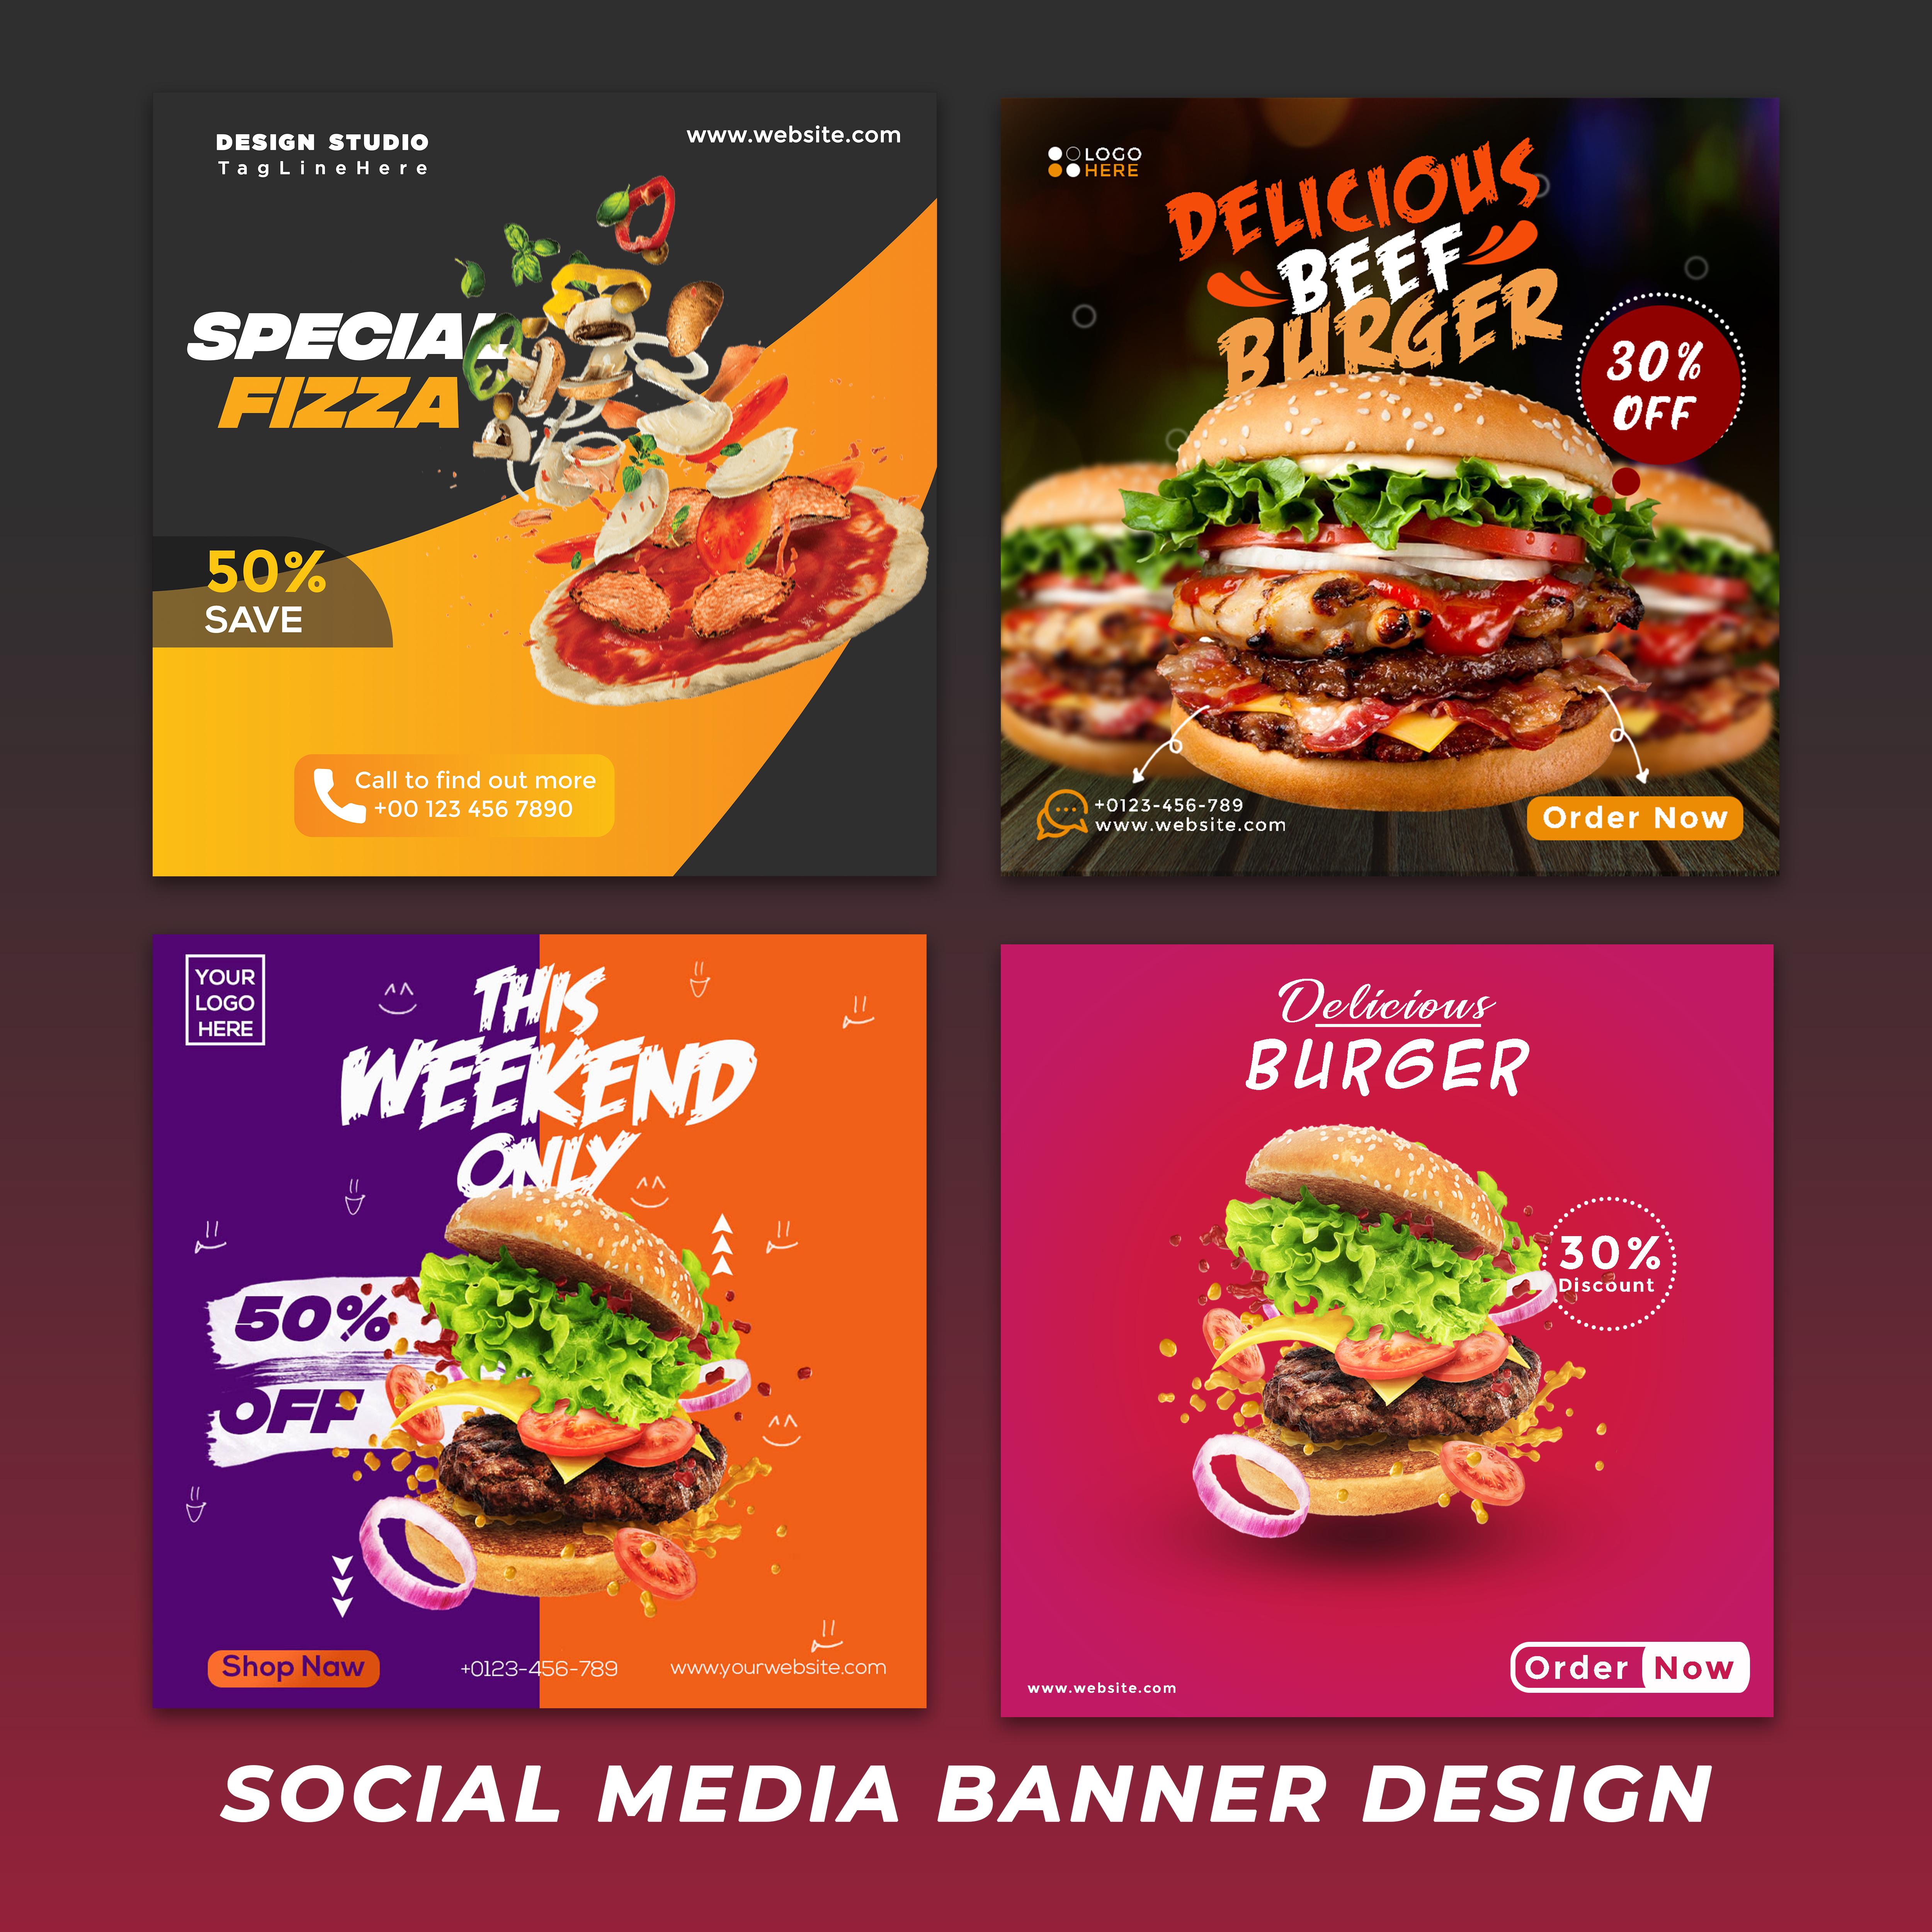 I will design a professional modern Social Media Banner Design